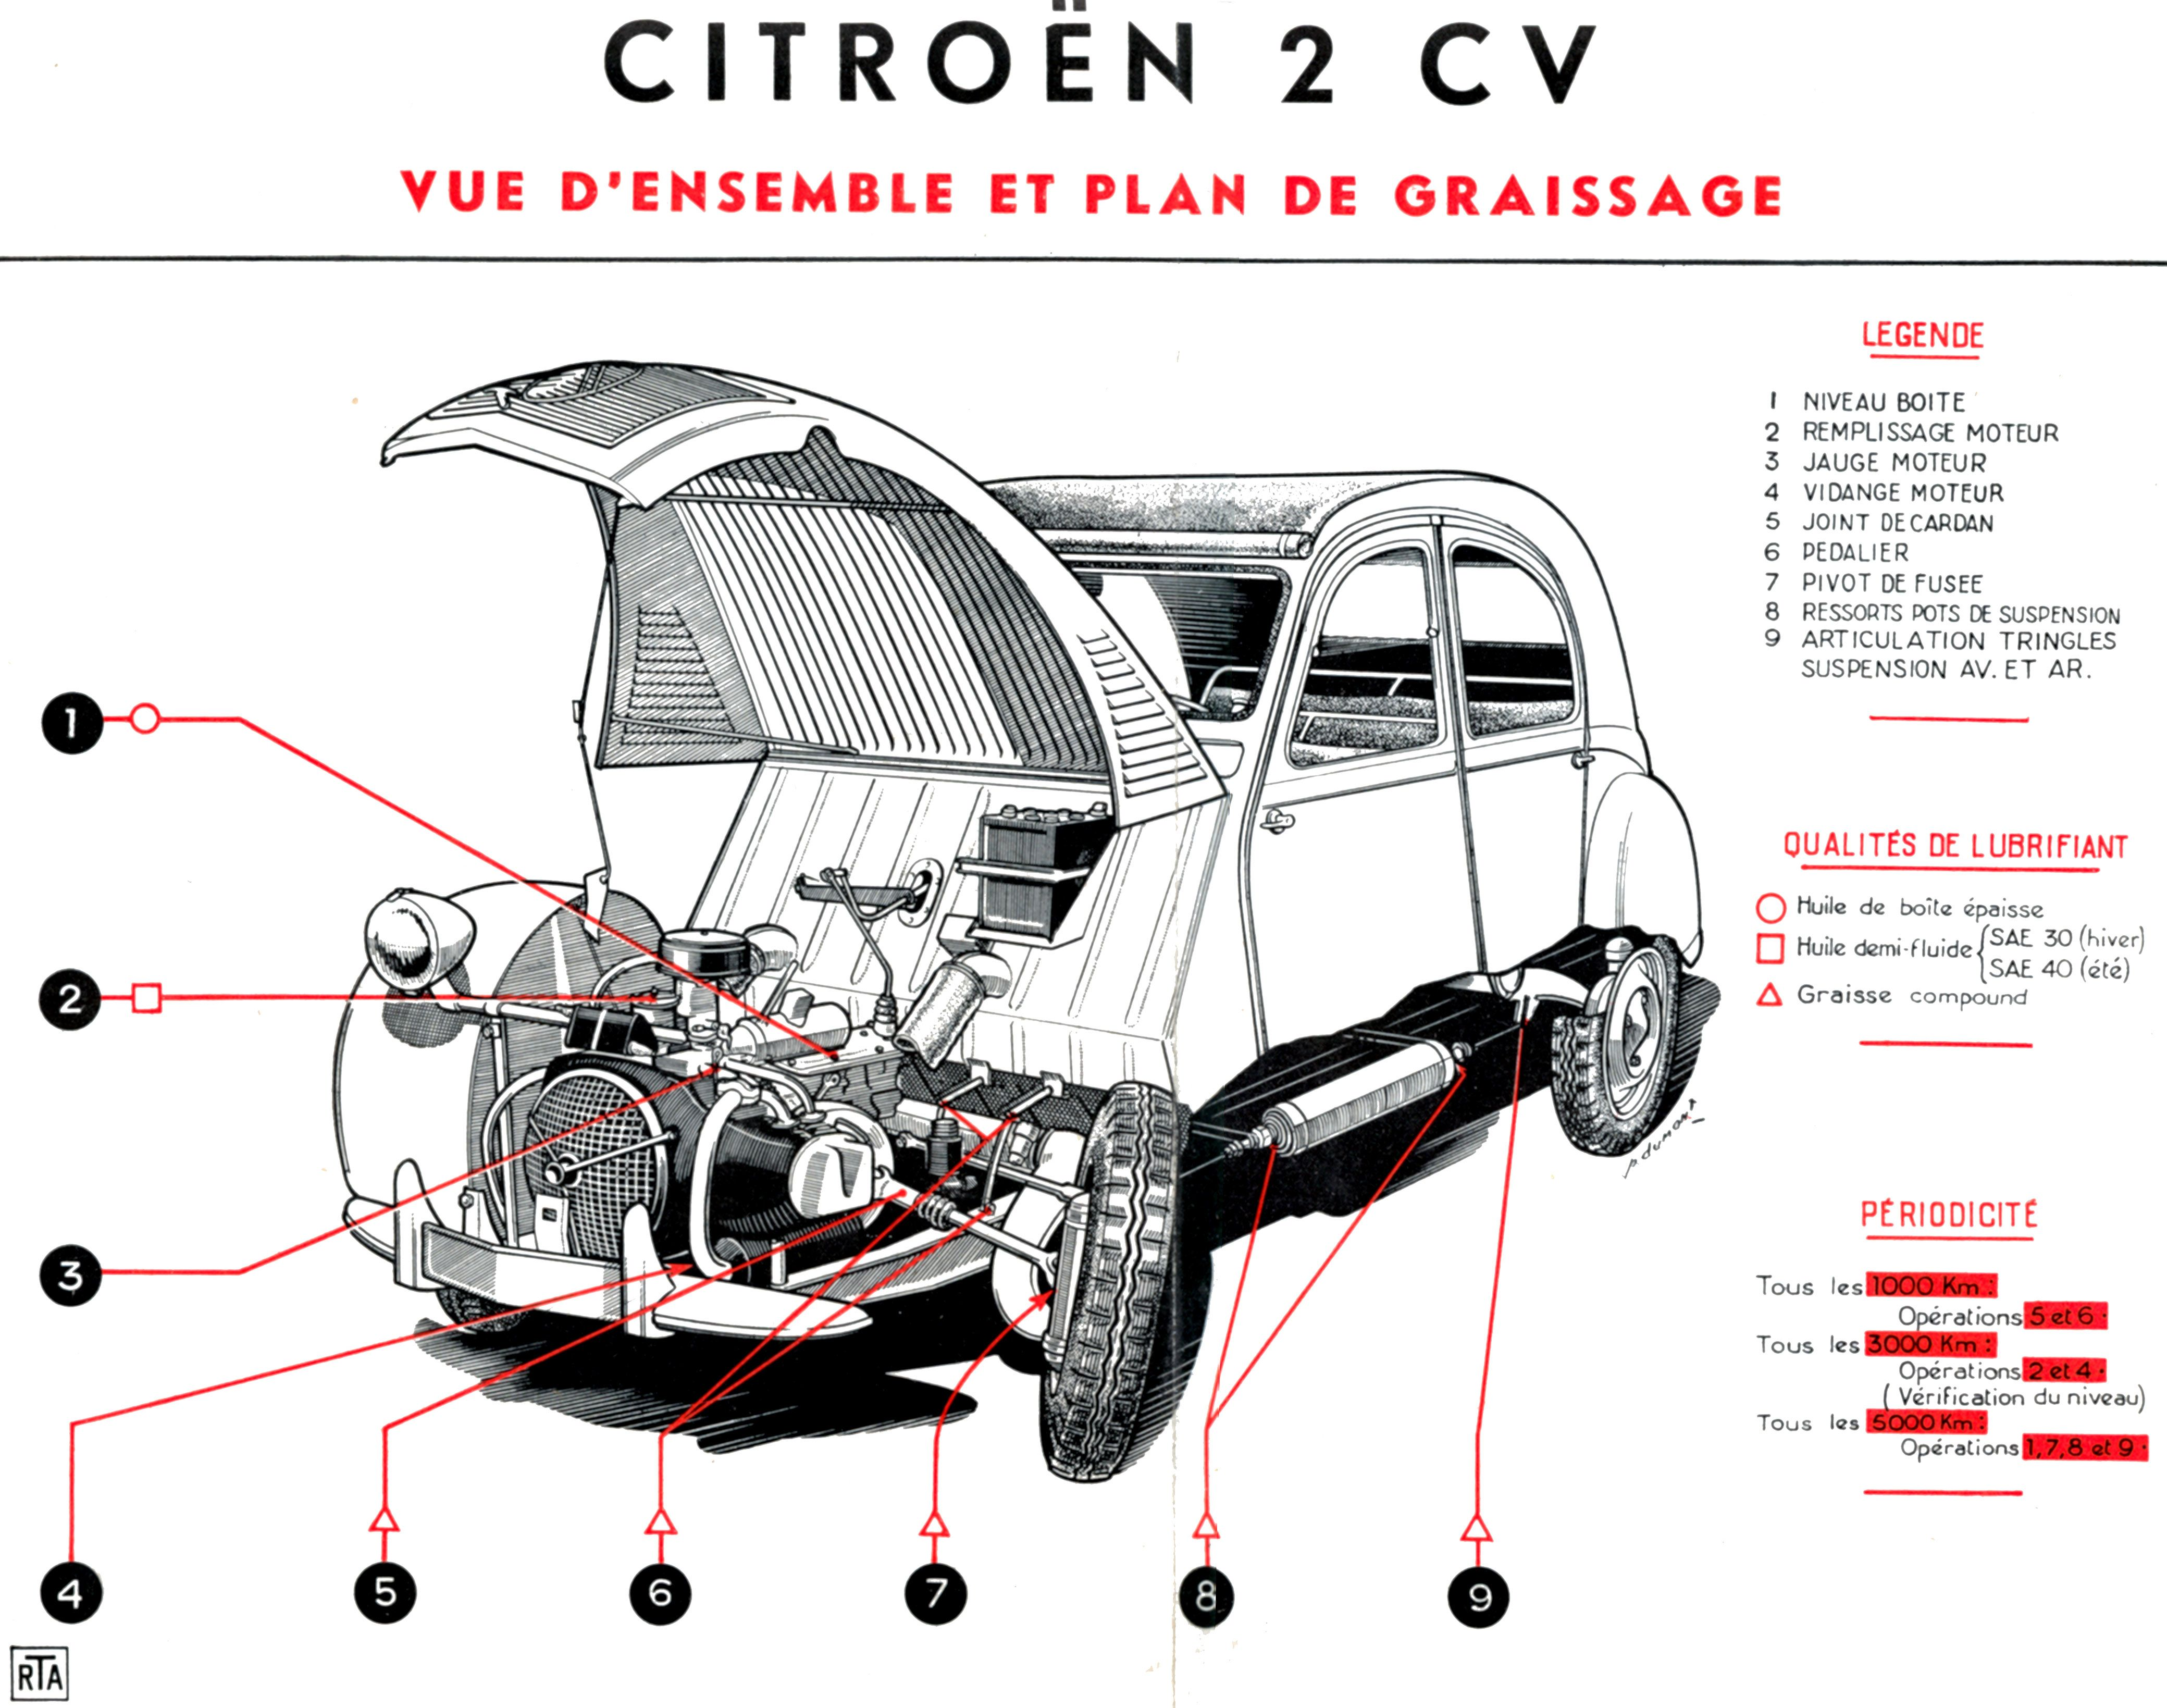 Zonas De Engrase De Un Citroen 2cv Eerste Auto Auto Auto Tekeningen